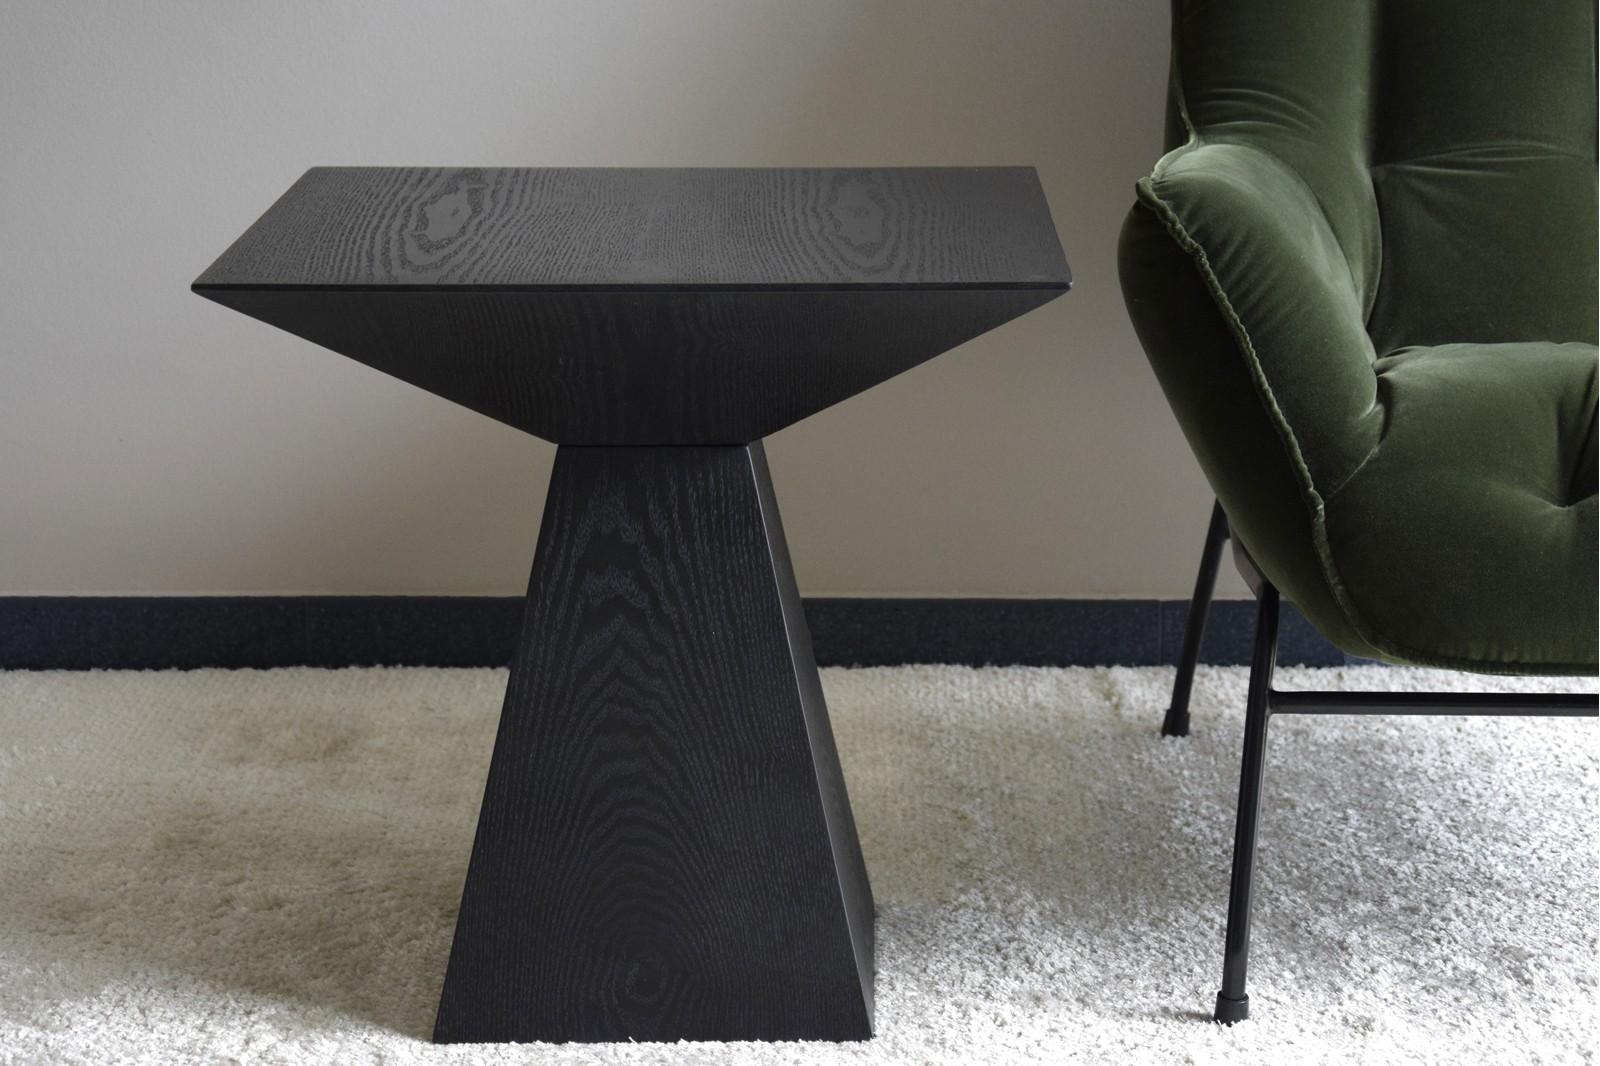 SQUARE SIDE TABLE. MATT BLACK ASH VENEER.